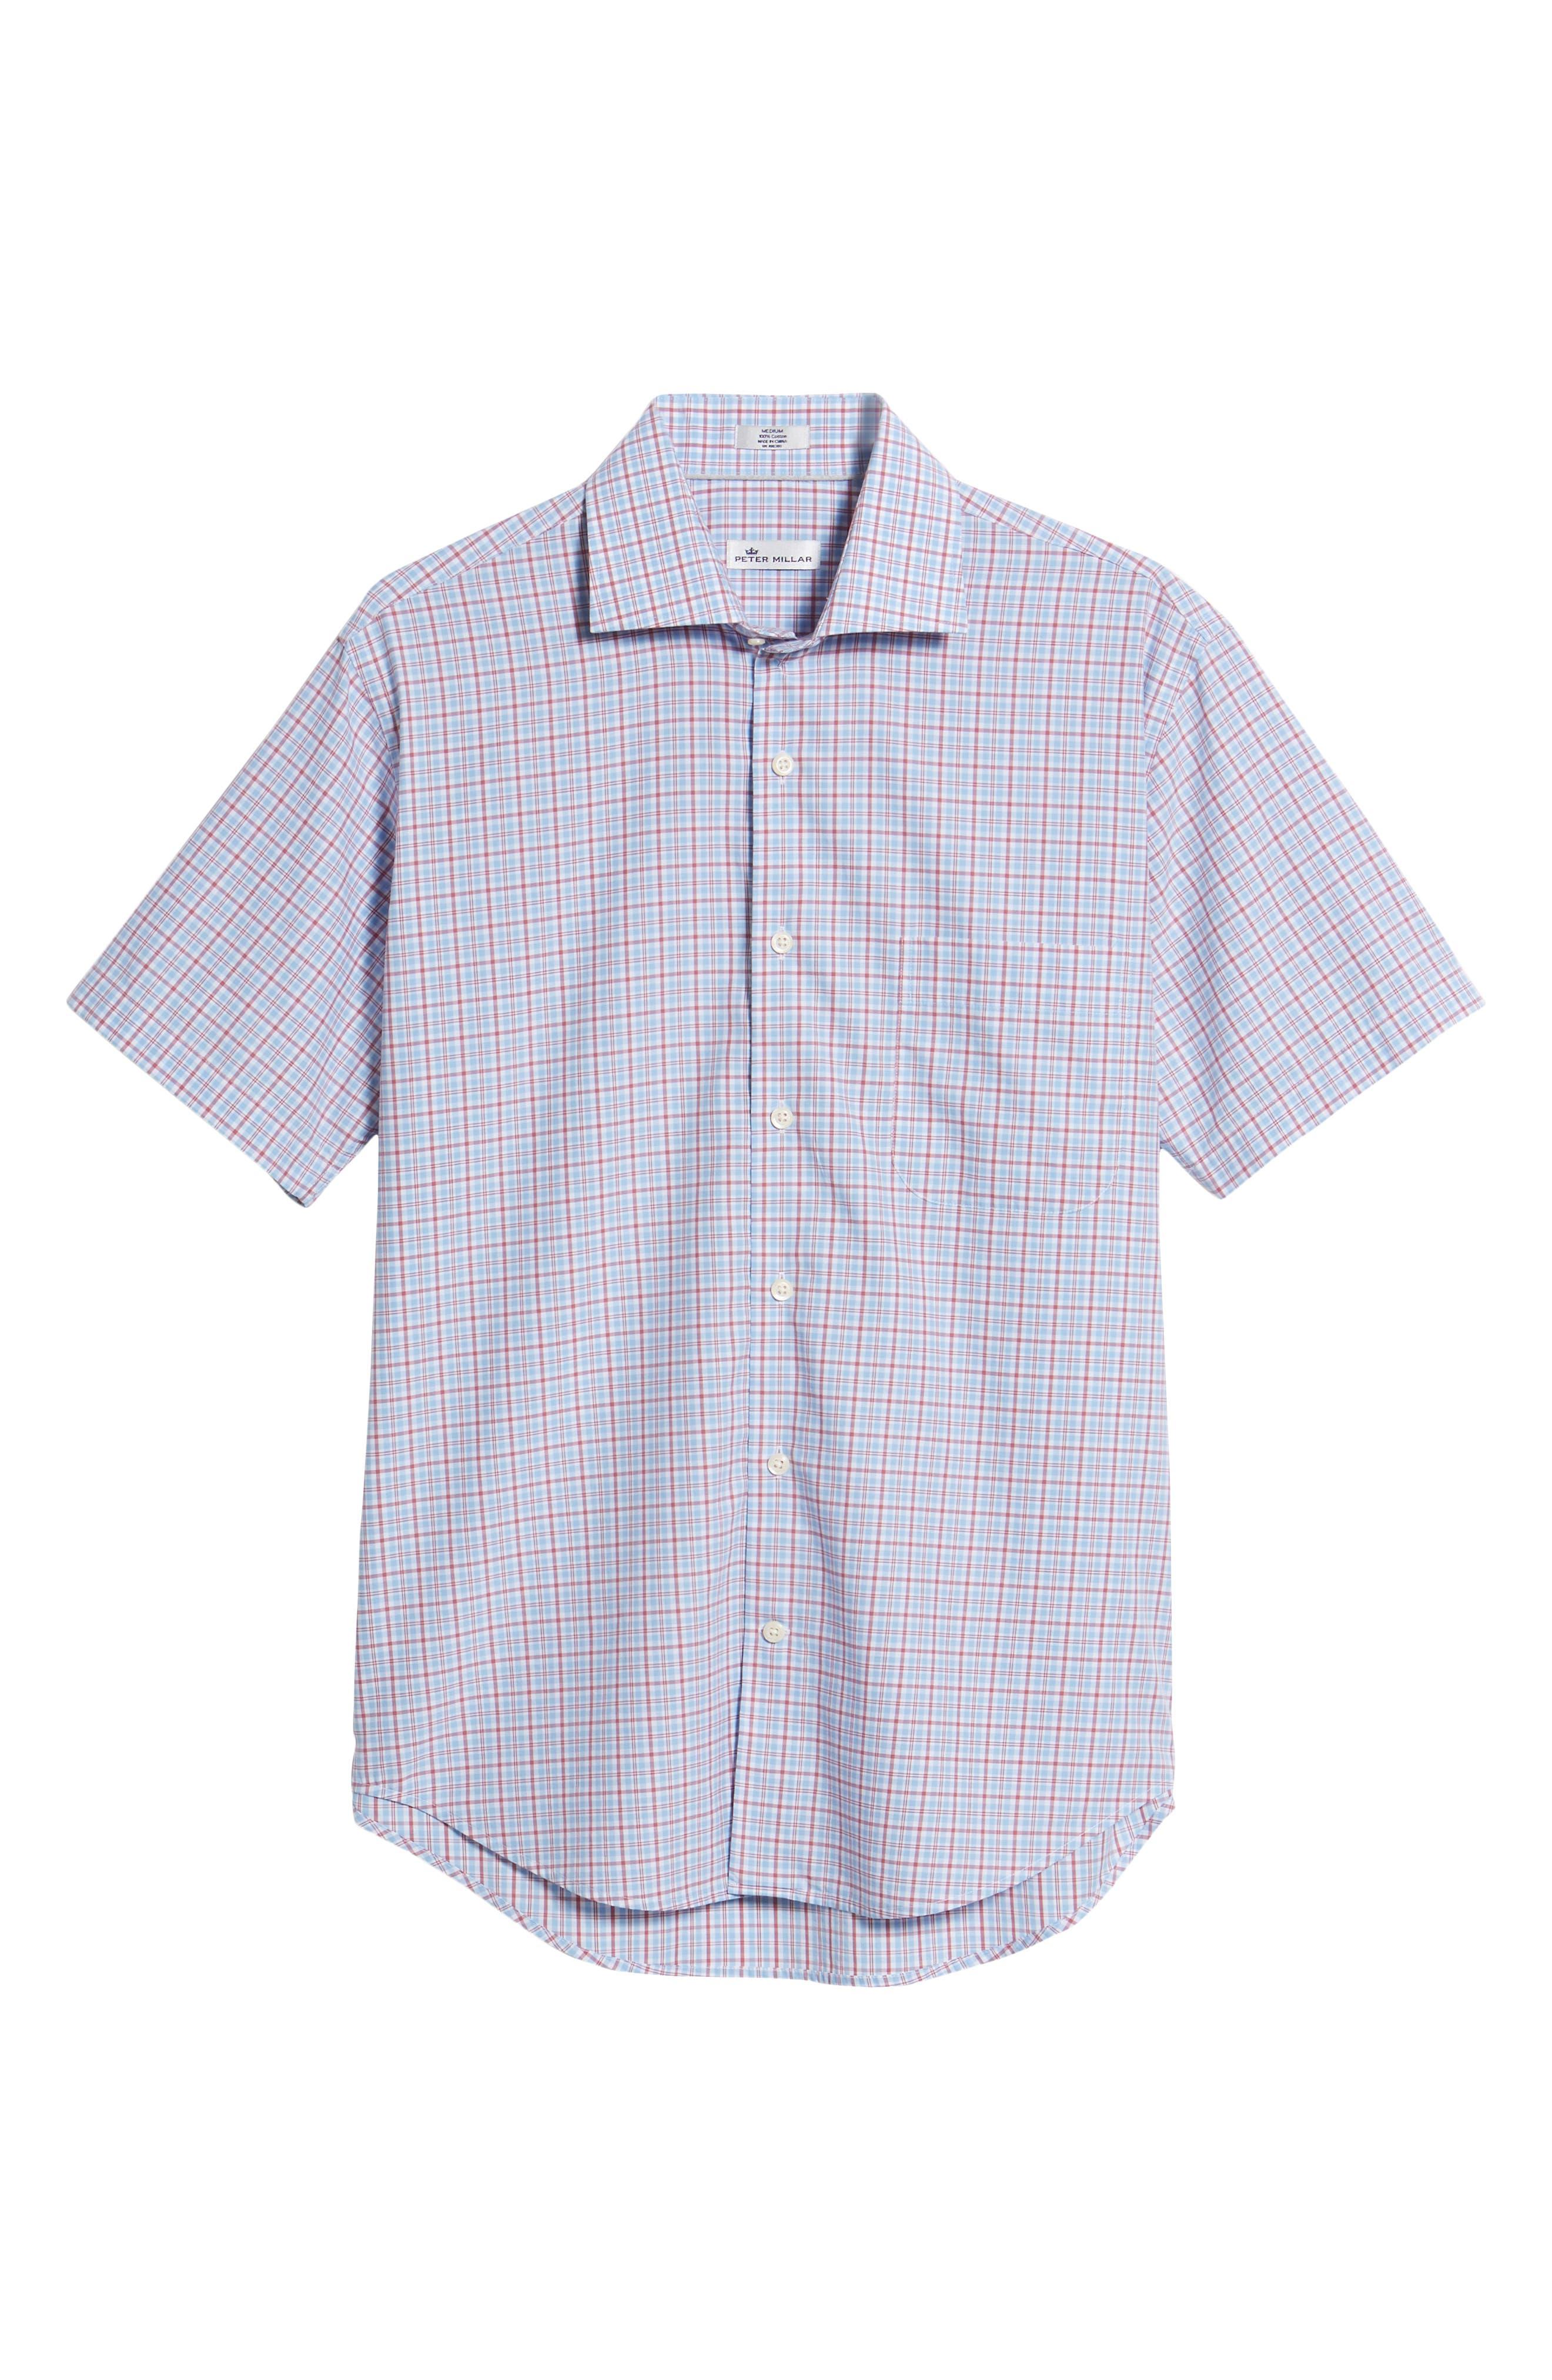 Delridge Regular Fit Tartan Sport Shirt,                             Alternate thumbnail 6, color,                             400